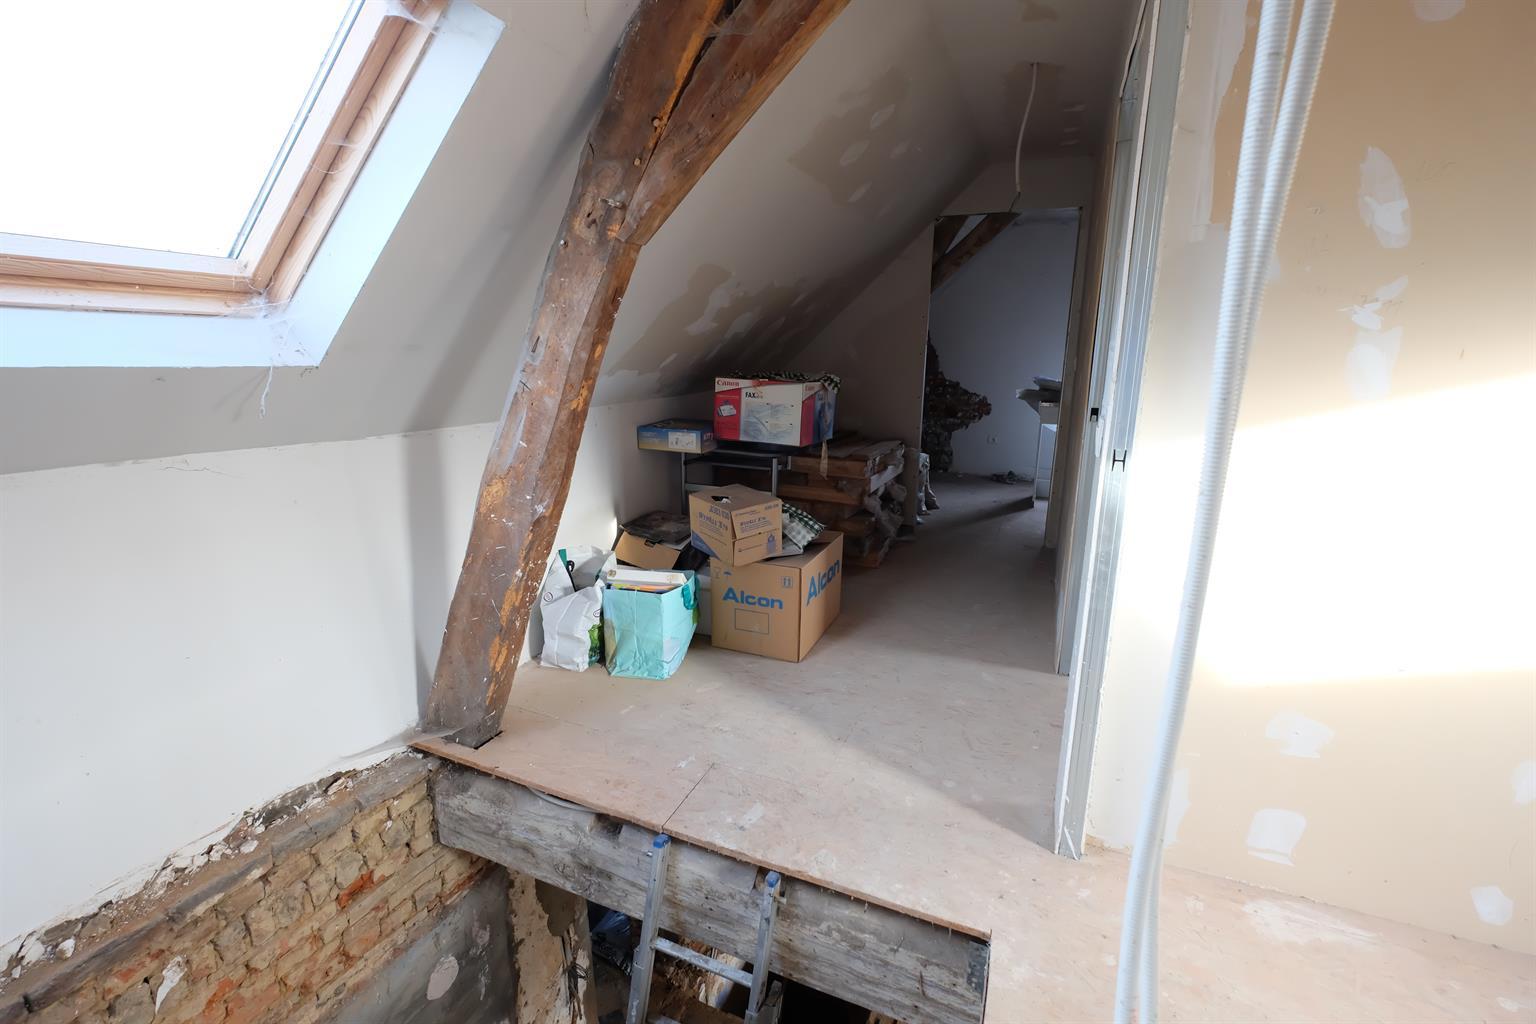 Maison - Tubize Oisquercq - #4398600-3